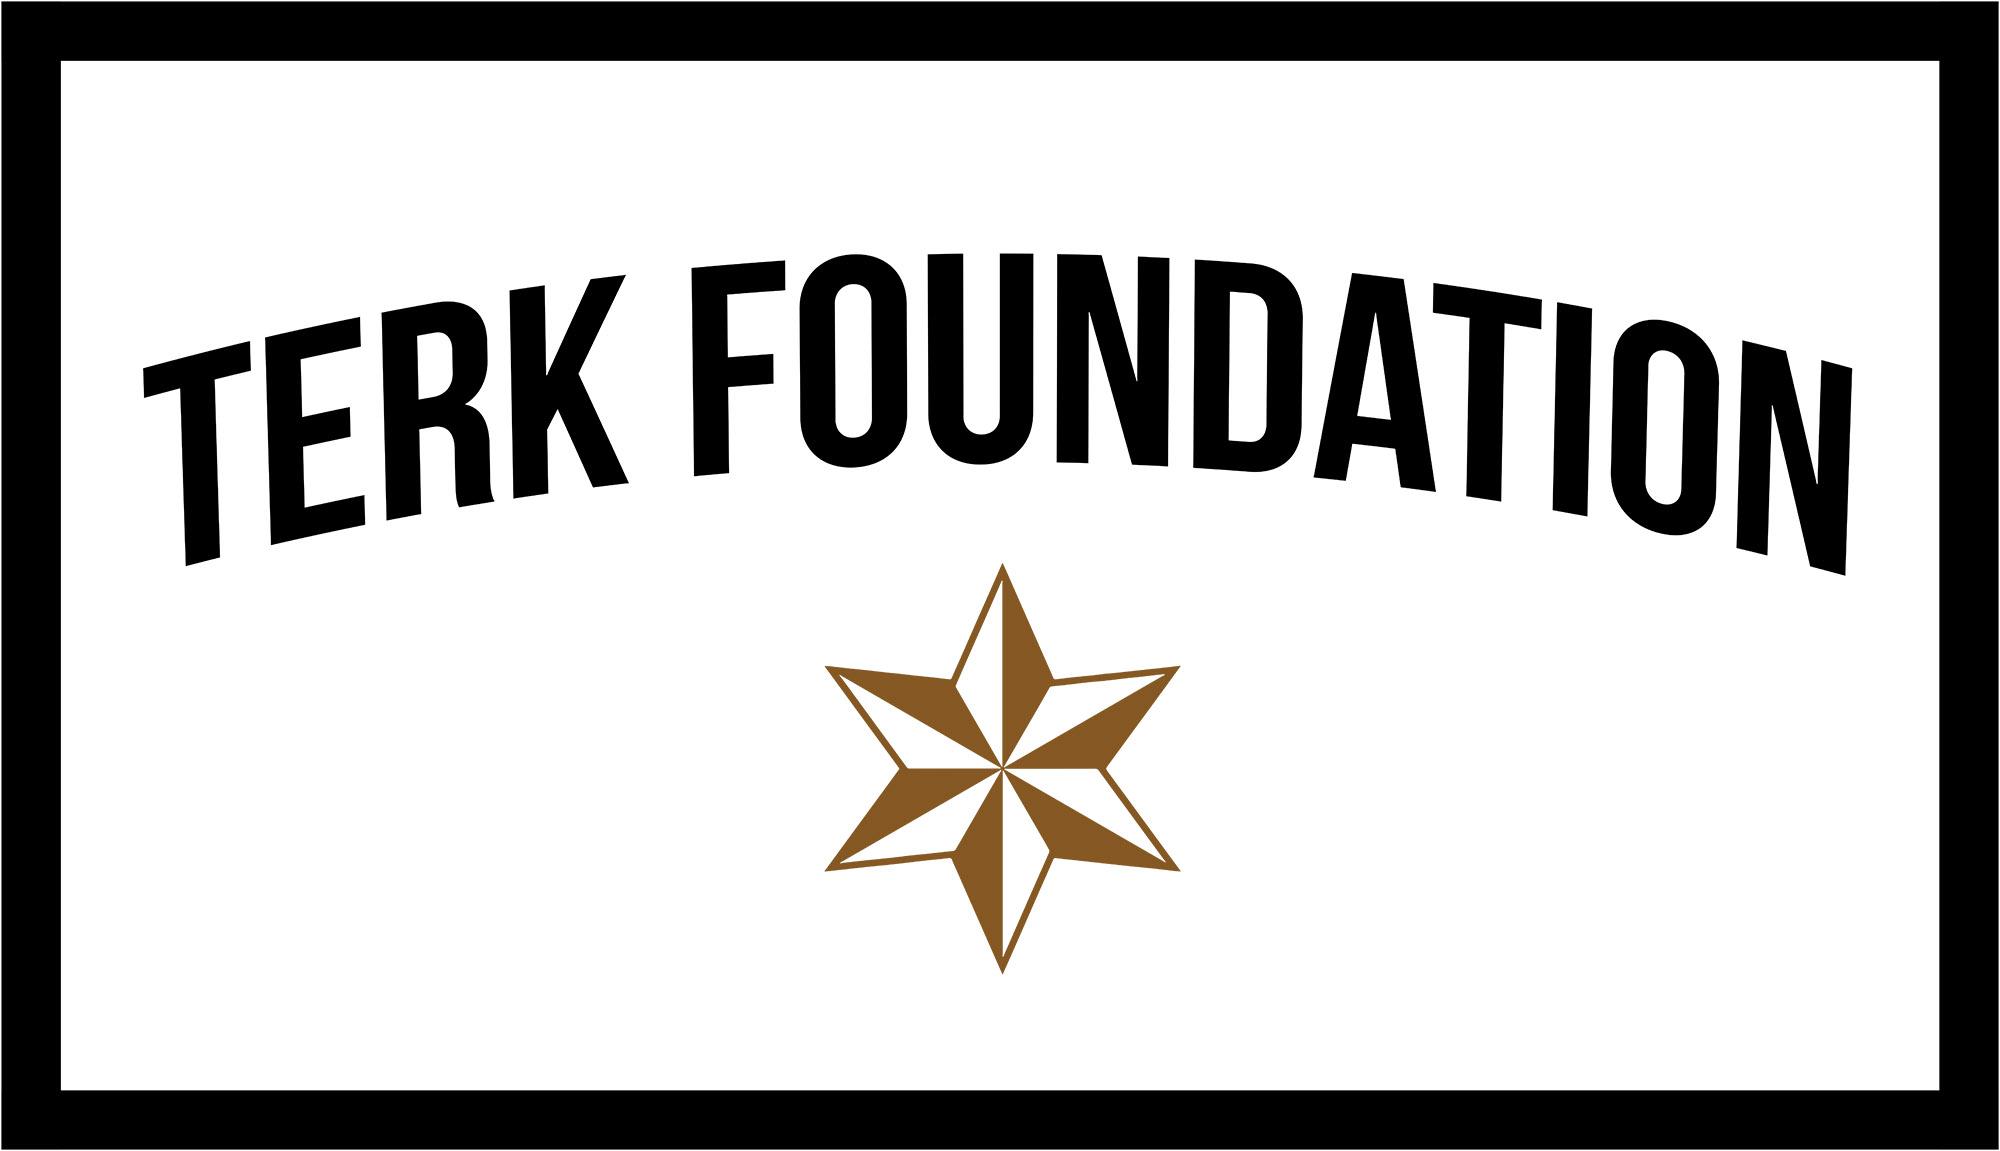 Terk Foundation